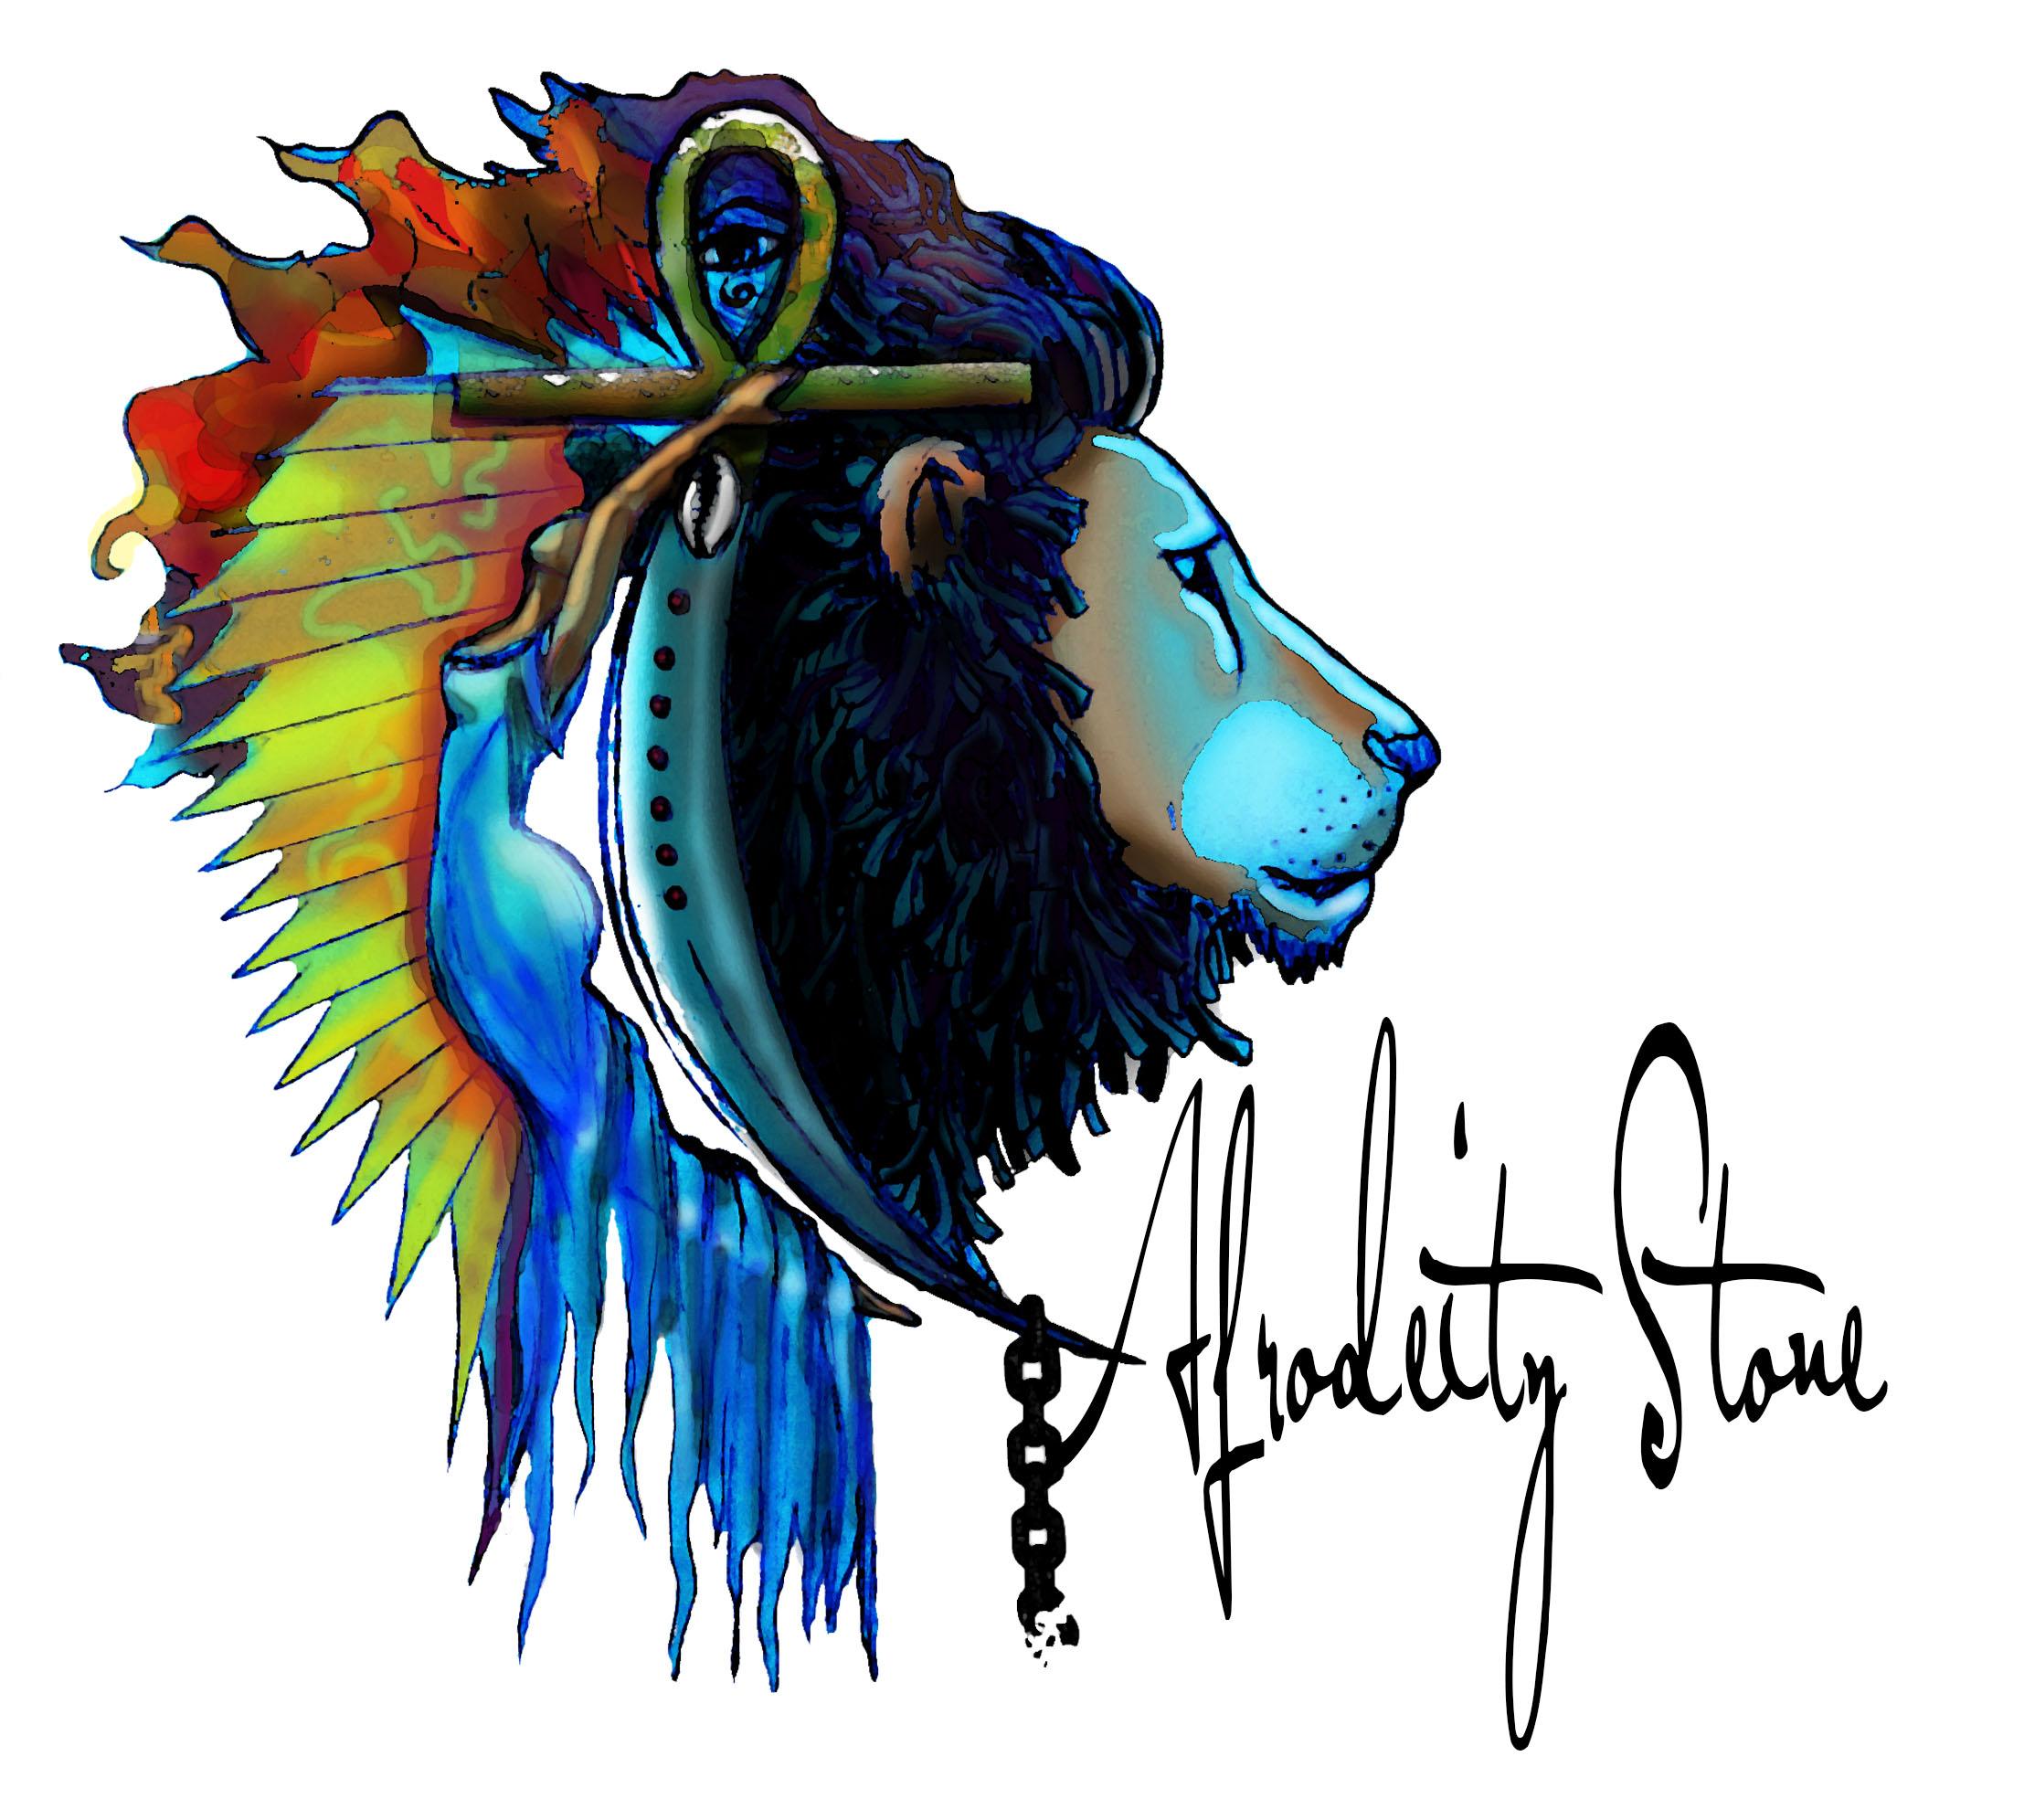 afrodeity stone the starseed healer | sistah fiyah music